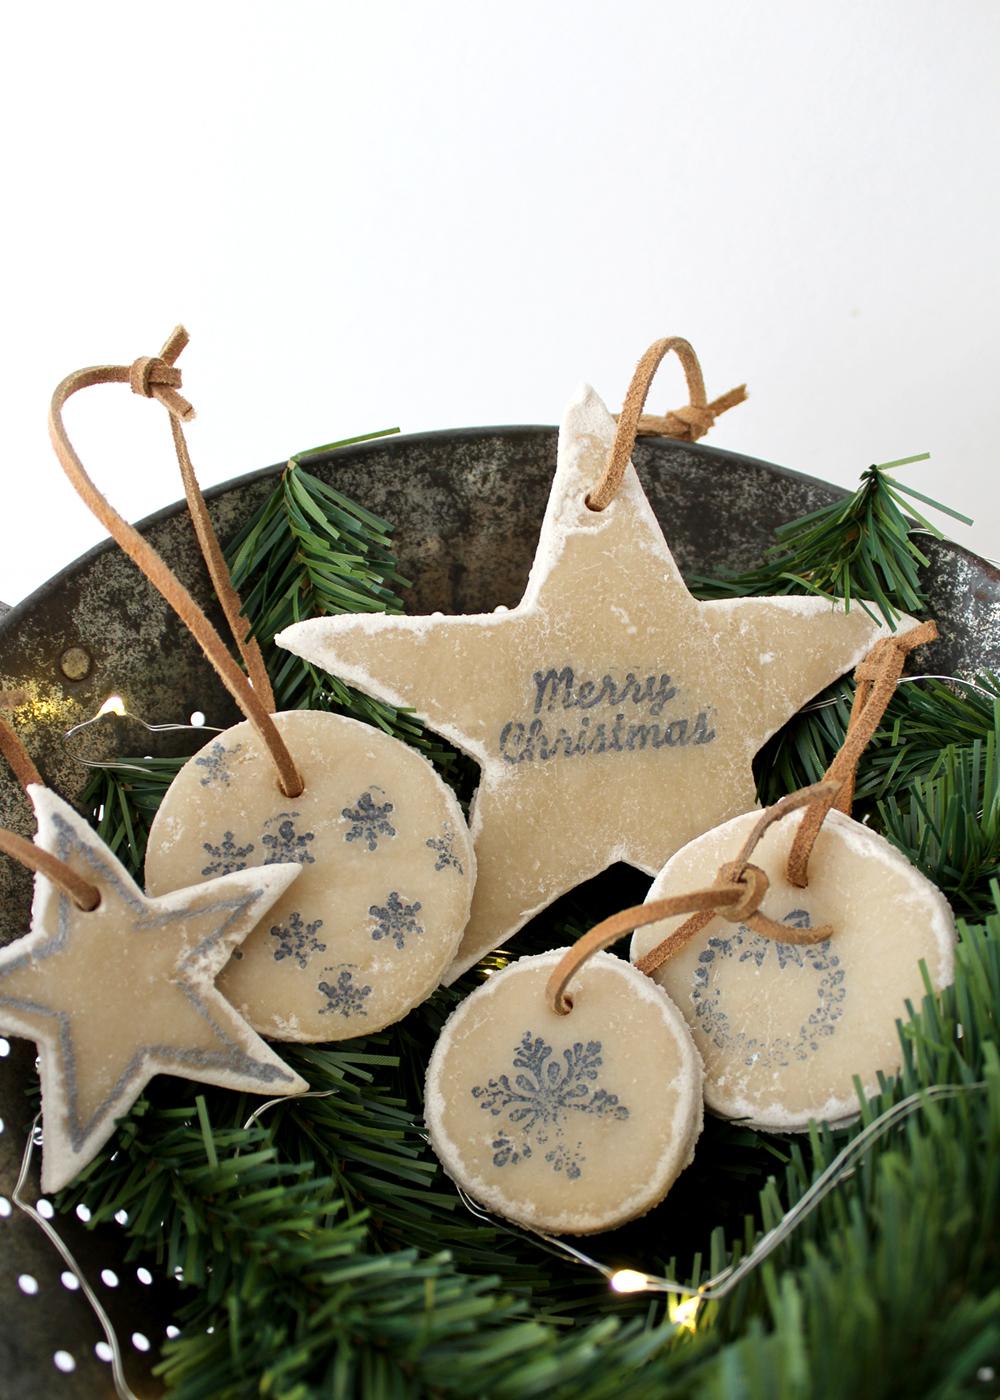 no-bake salt dough ornaments make great Christmas gifts